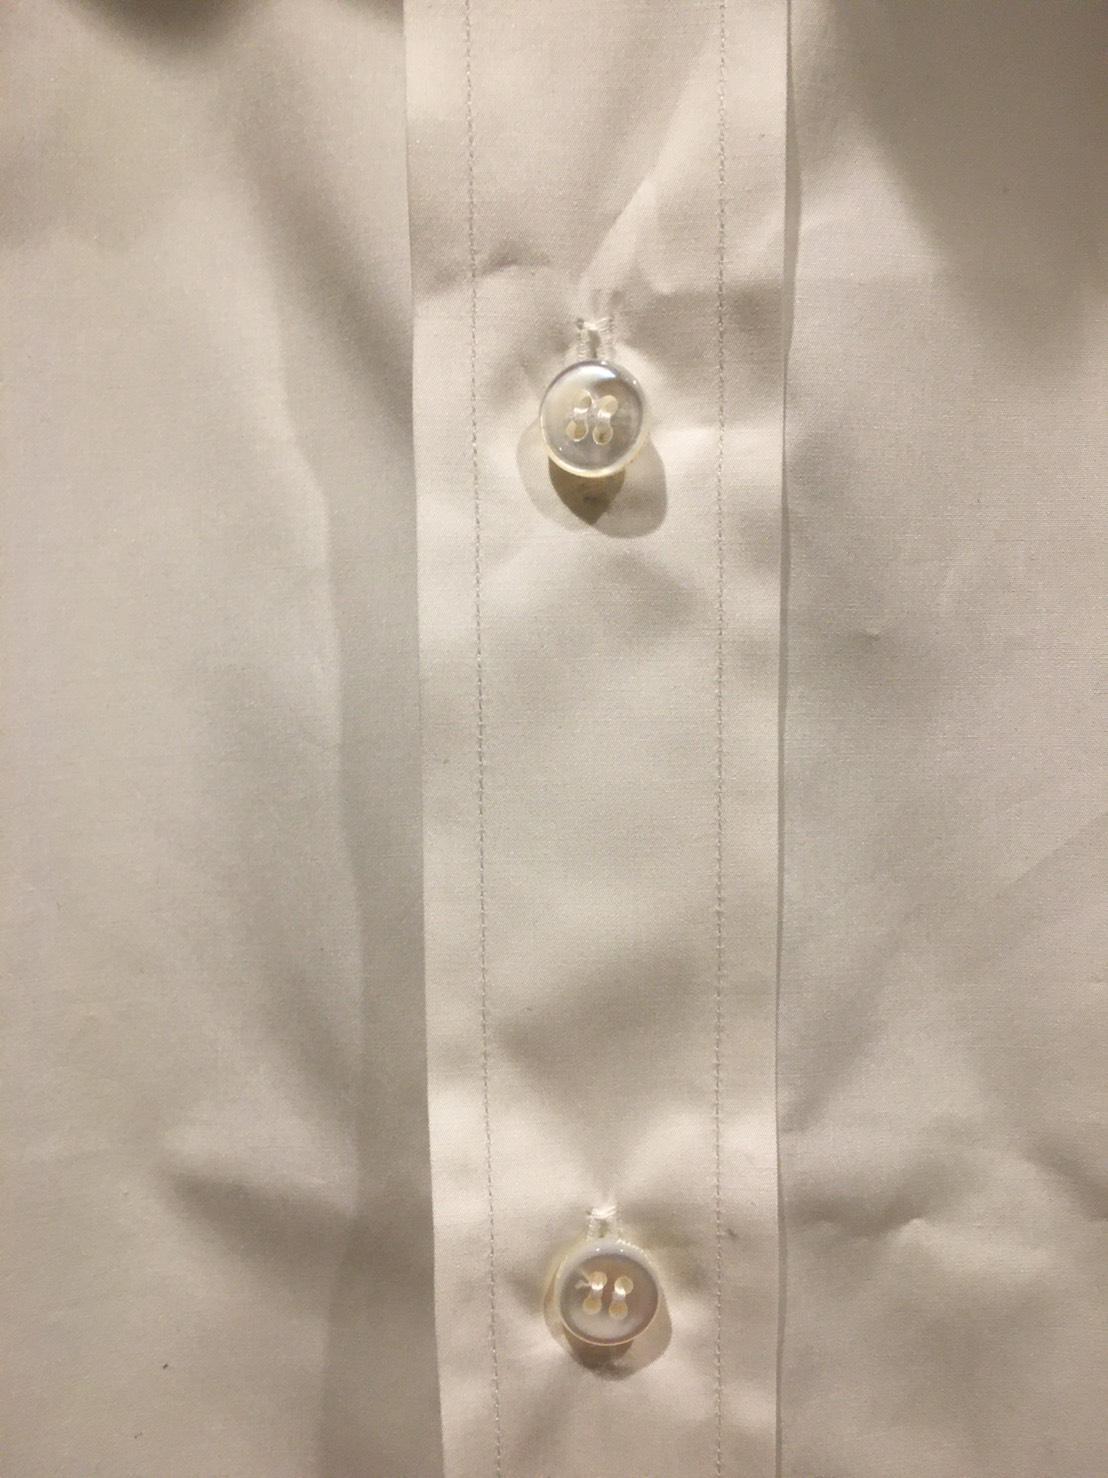 Brioni Bespoke Shirt plackett